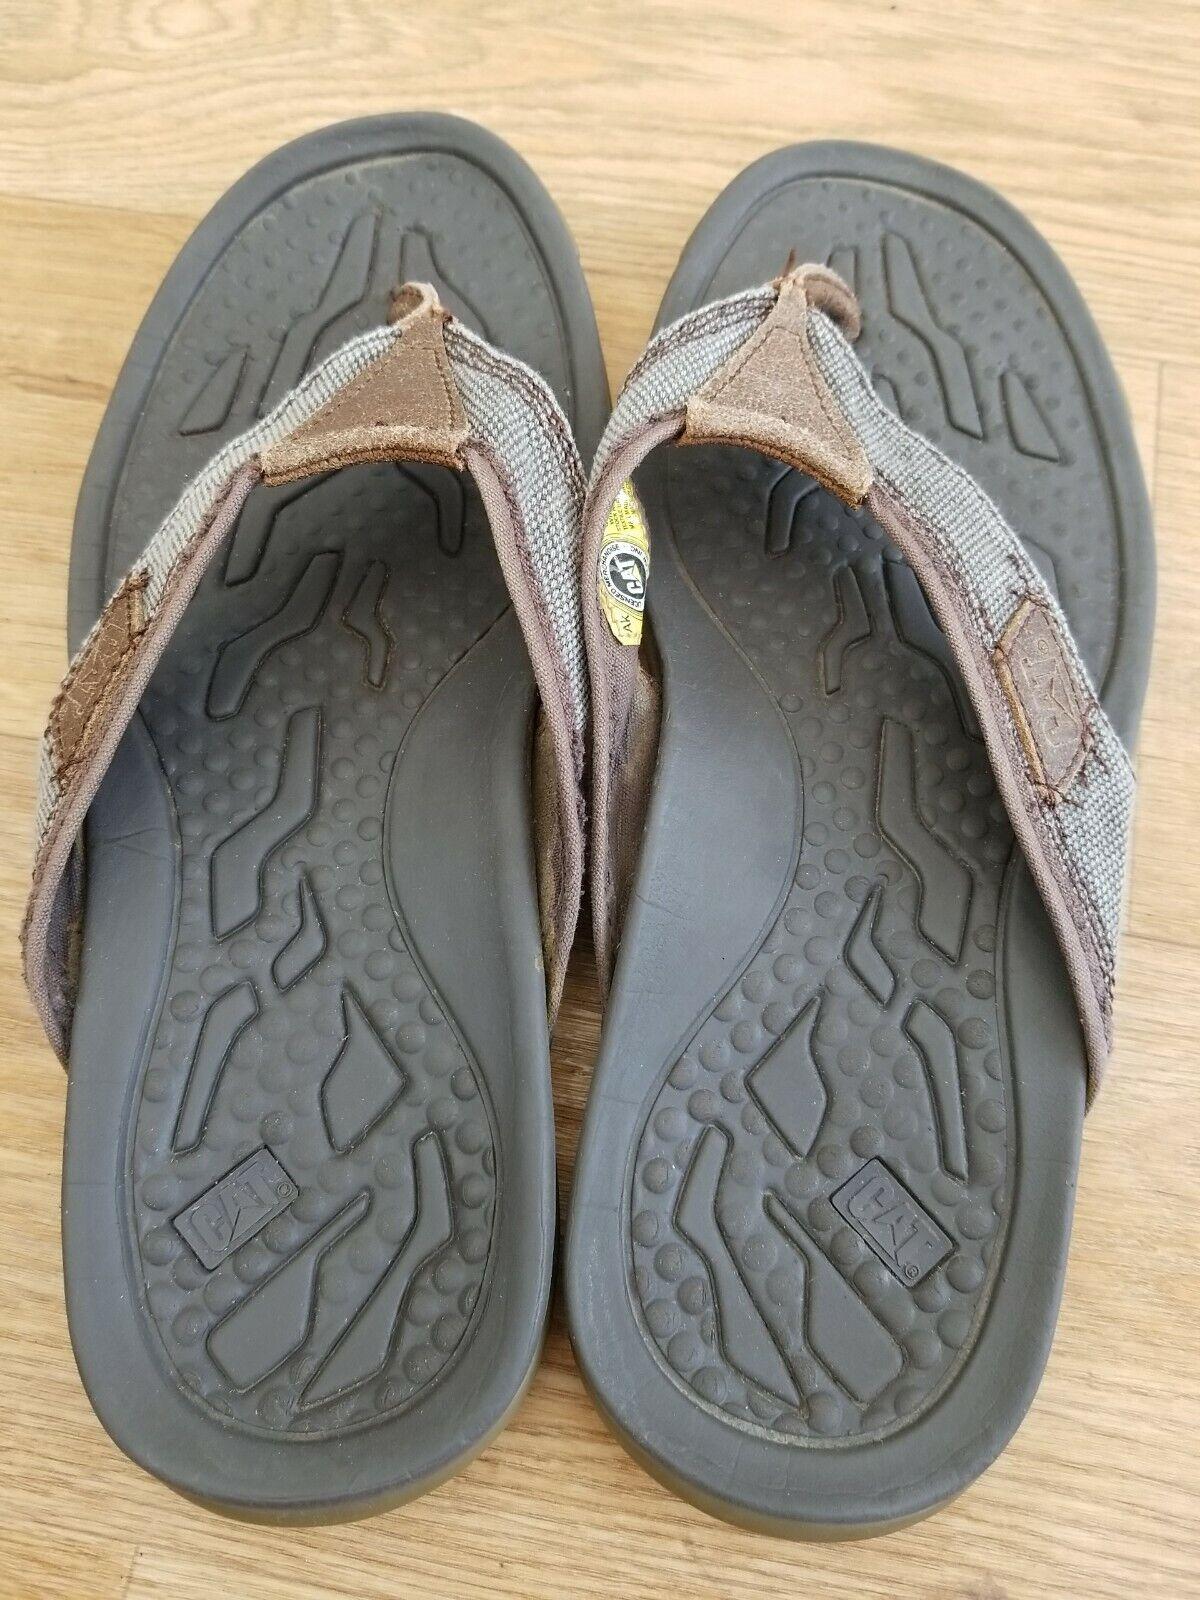 CATERPILLAR Galley Men's Brown Leather Slip On Toe Post Sandals UK 8 EU 42